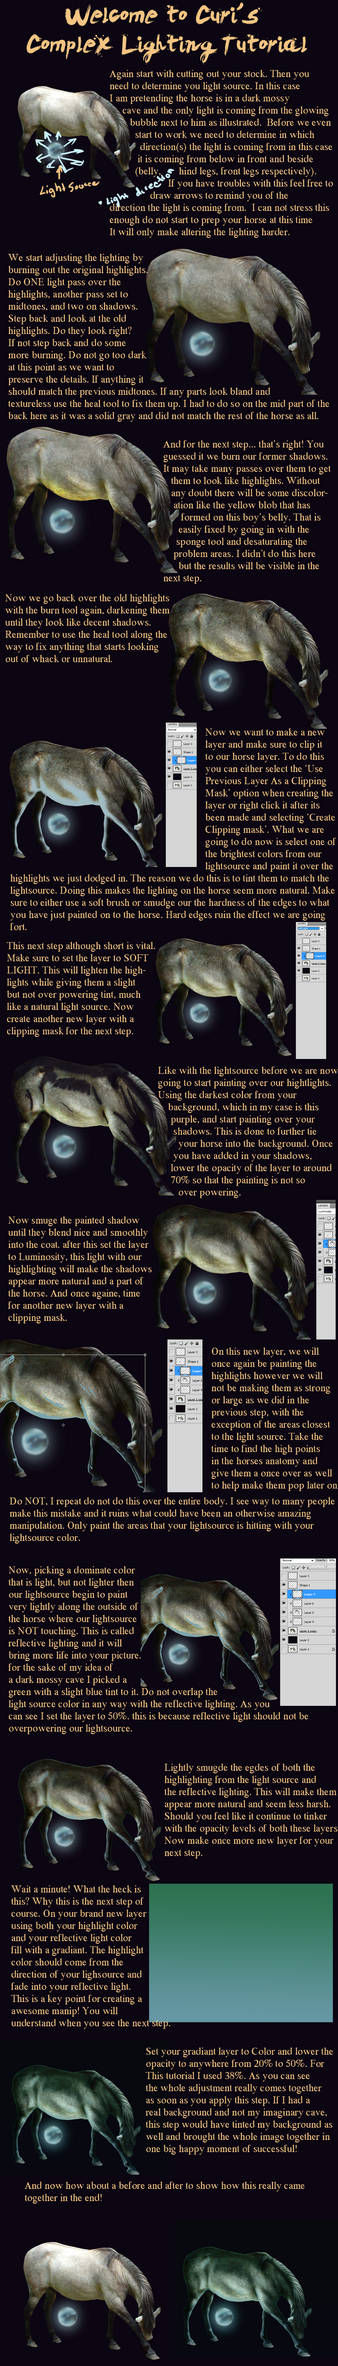 Curi's Tutorials: Changing the Lighting